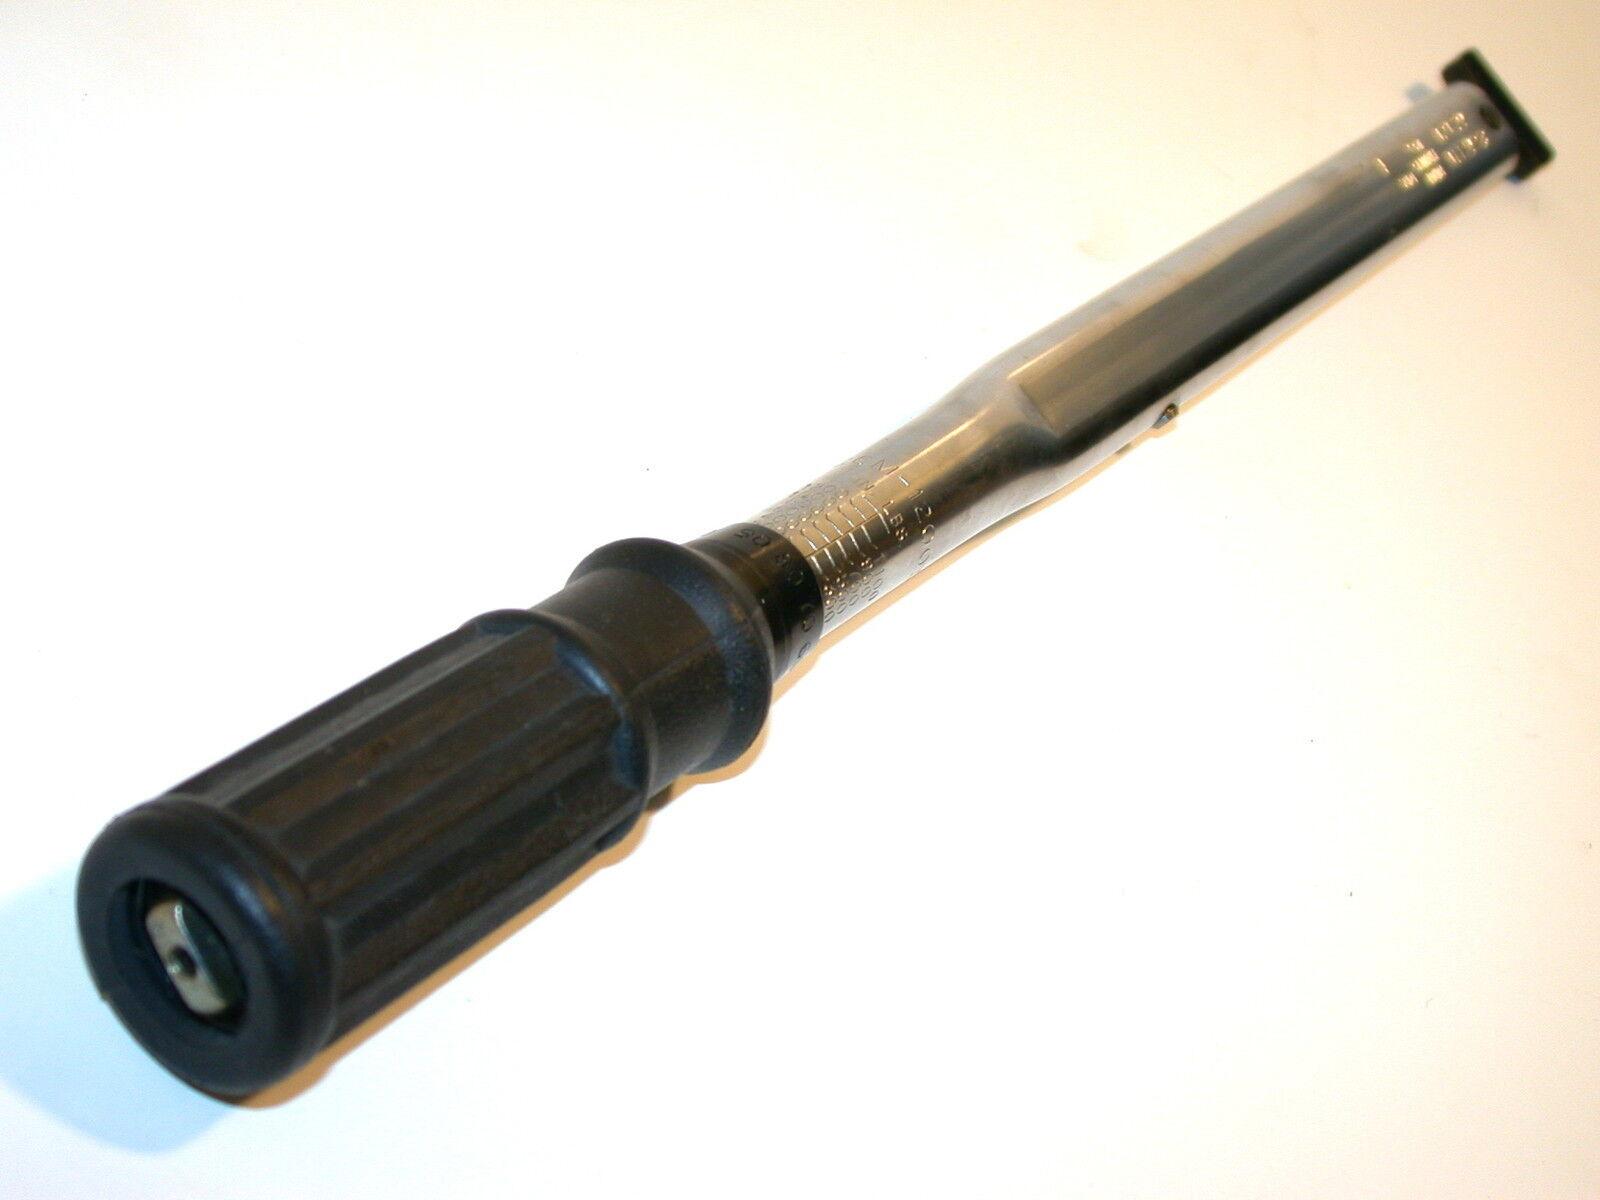 Bis zu 2 Sturtevant 508-3048cm lb Austauschbar Drehmomentschlüssel CCM-1200I